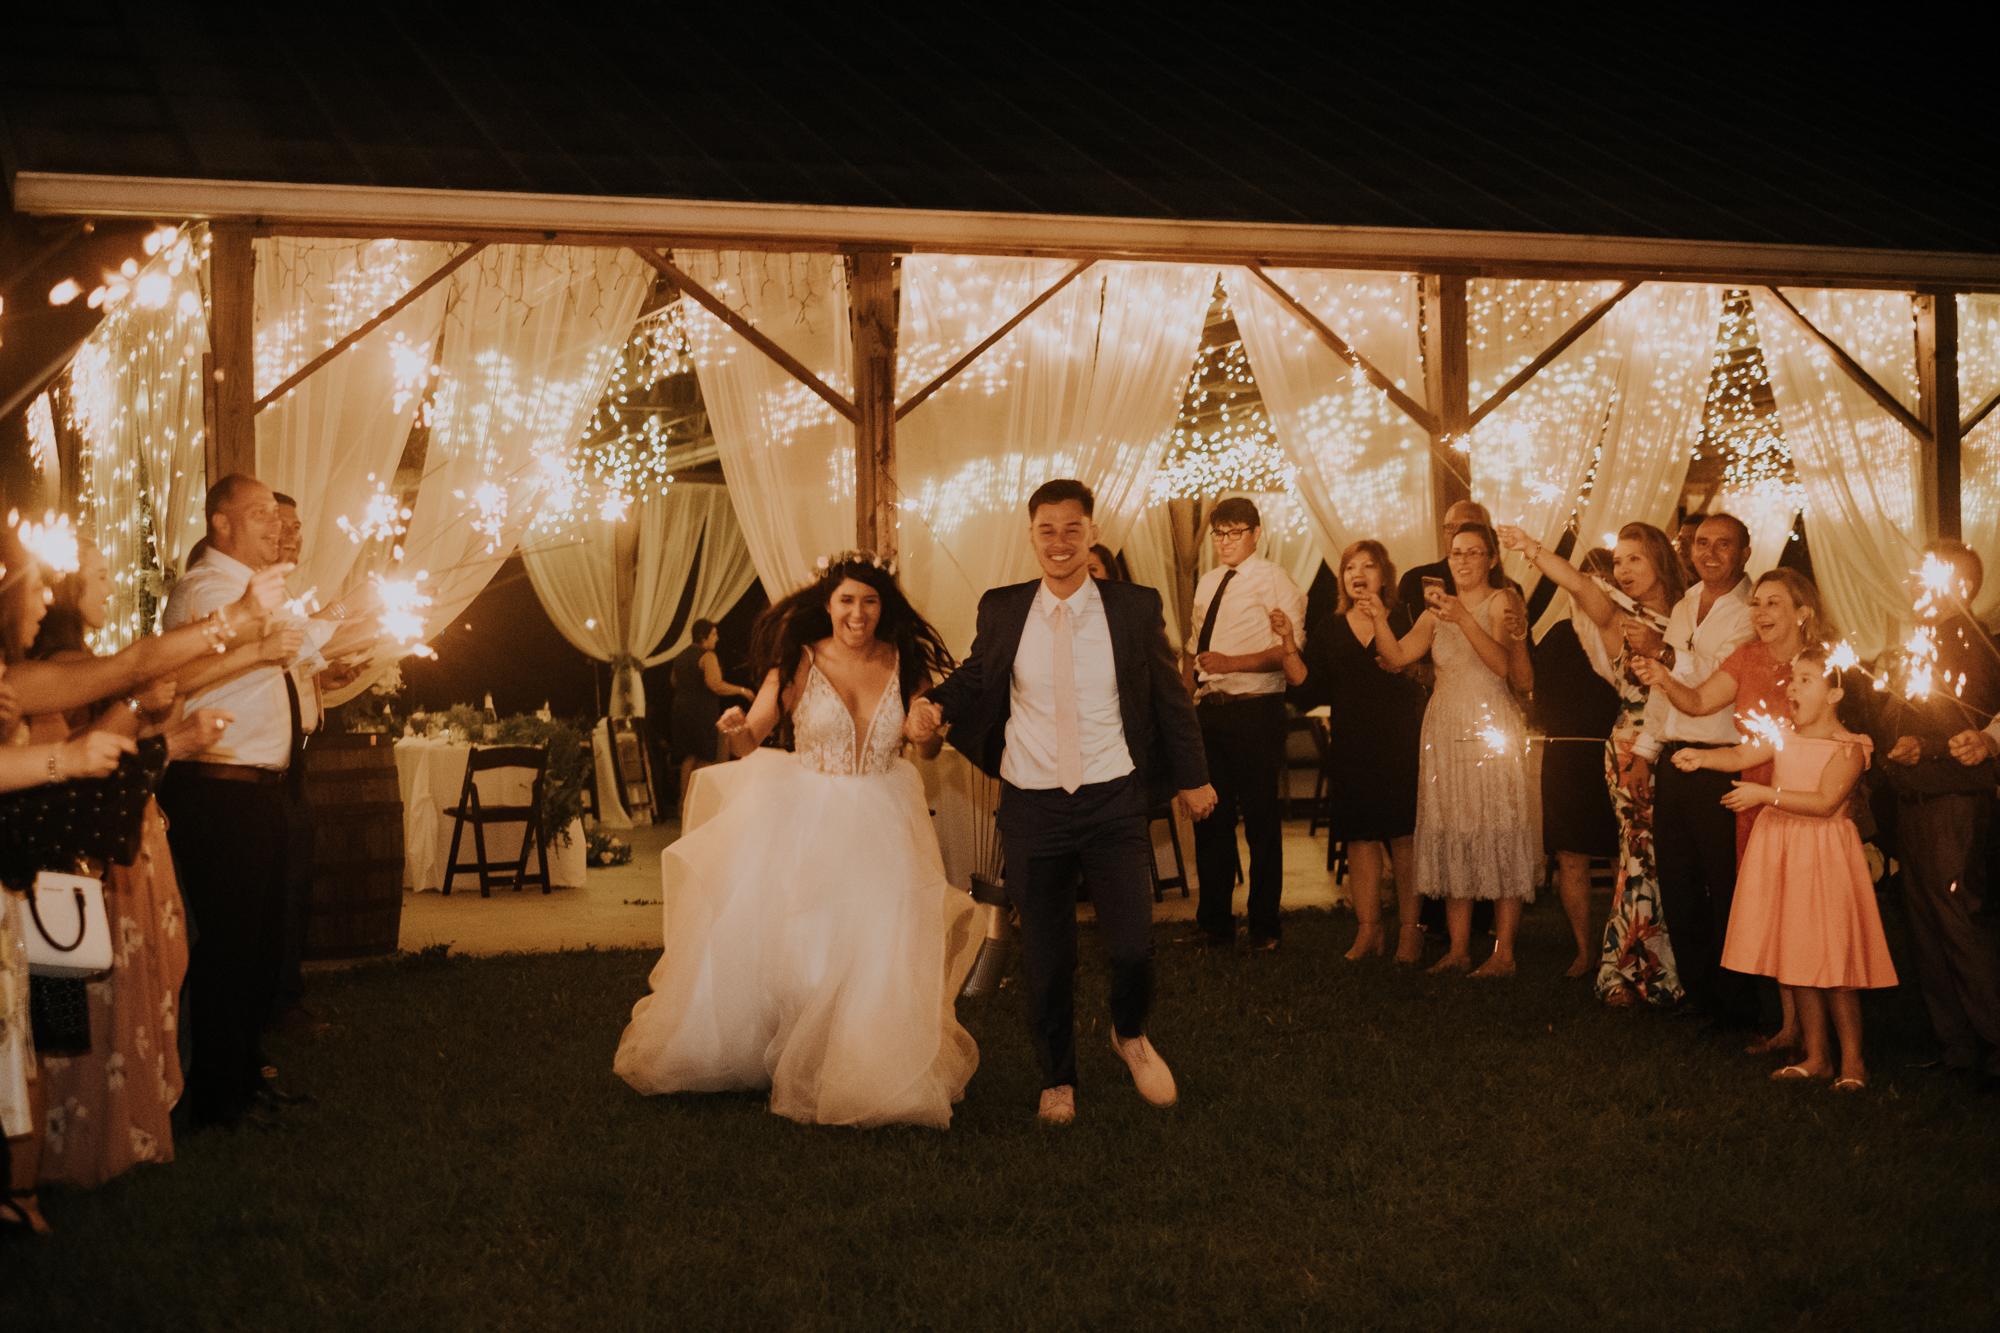 sparkler exit | wedding sparkler exit | romantic sparkler exit | outdoor Florida wedding | sarasota wedding